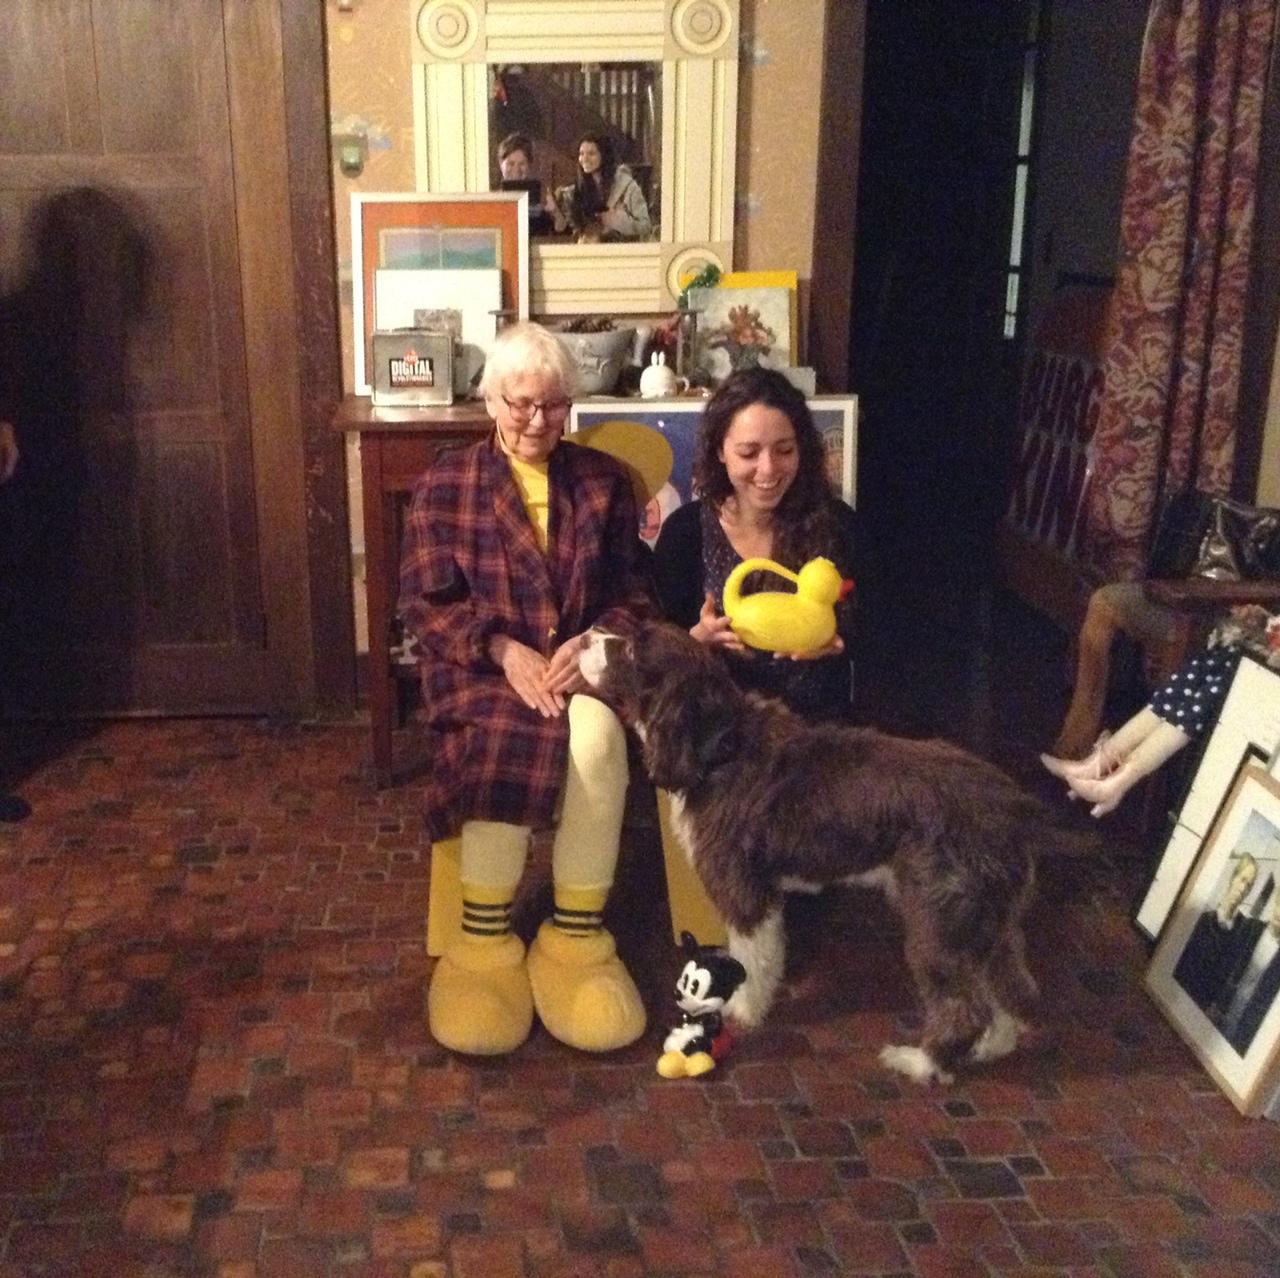 Thanksgiving Day, 24 novembre 2016. Rosa Sessa con Denise Scott Brown e il cane Aalto. Photo Anita Naughton